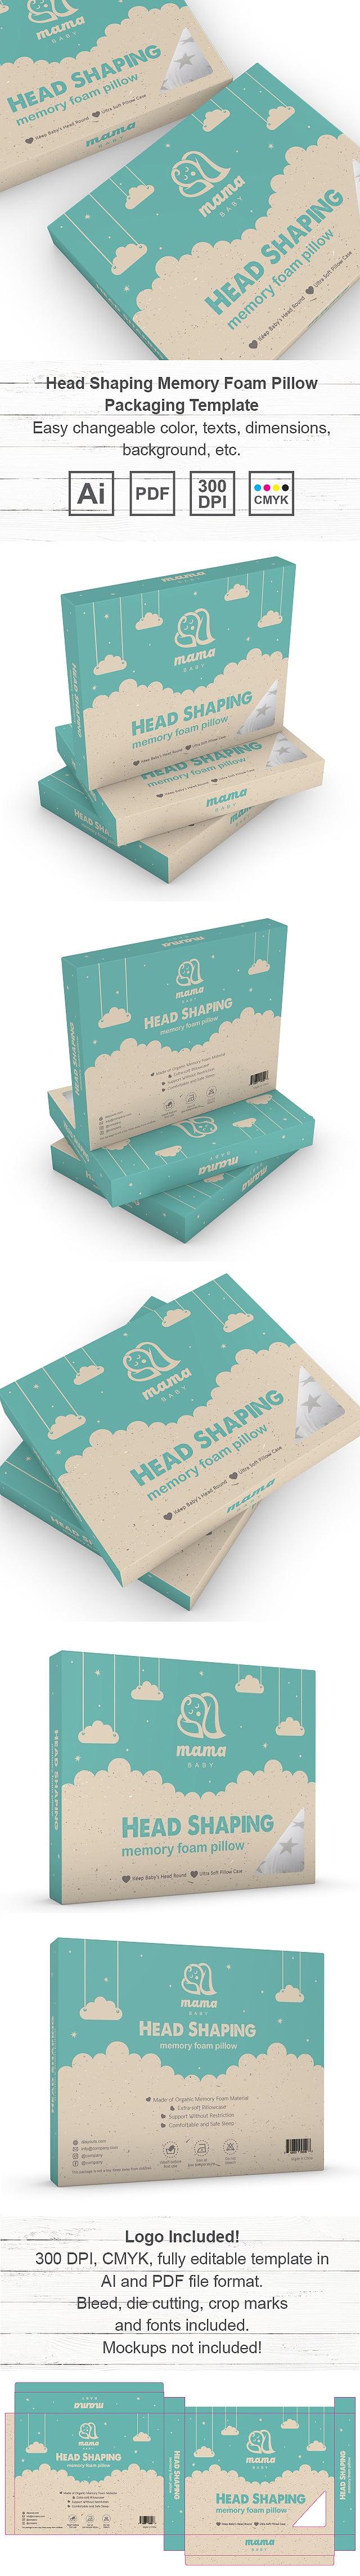 Head Shaping Memory Foam Pillow Packaging Template